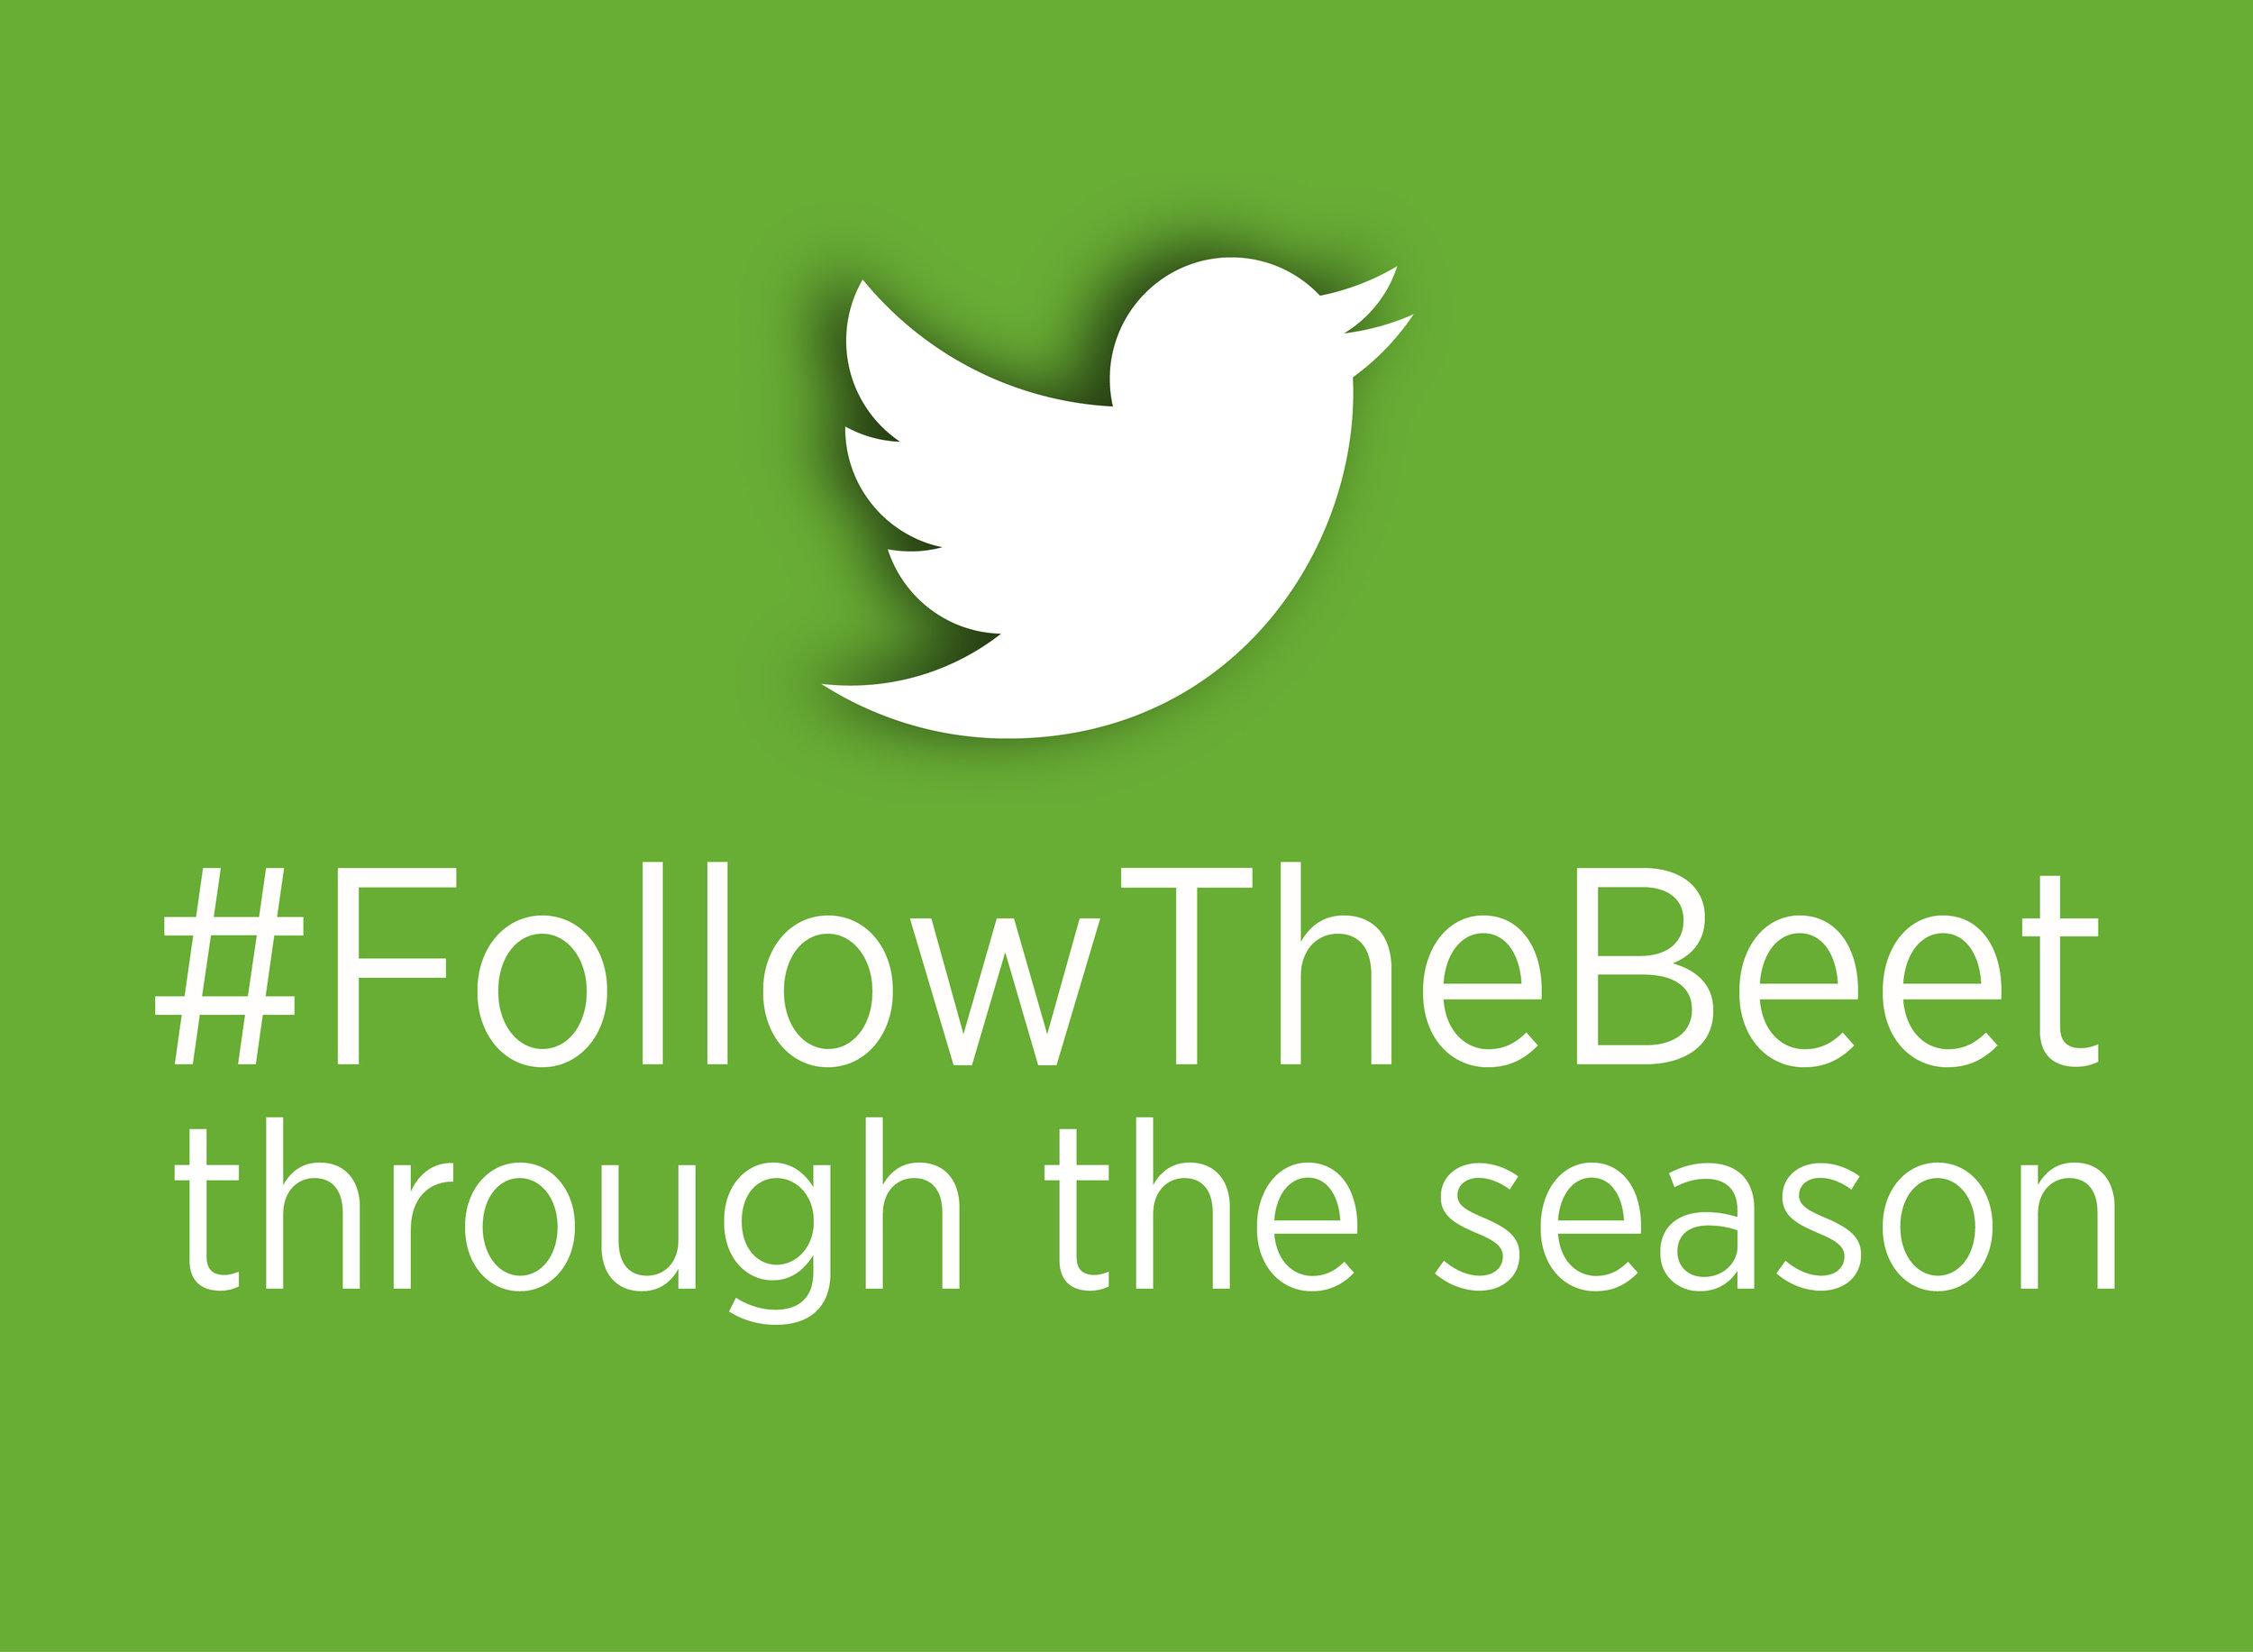 FollowTheBeet.jpg